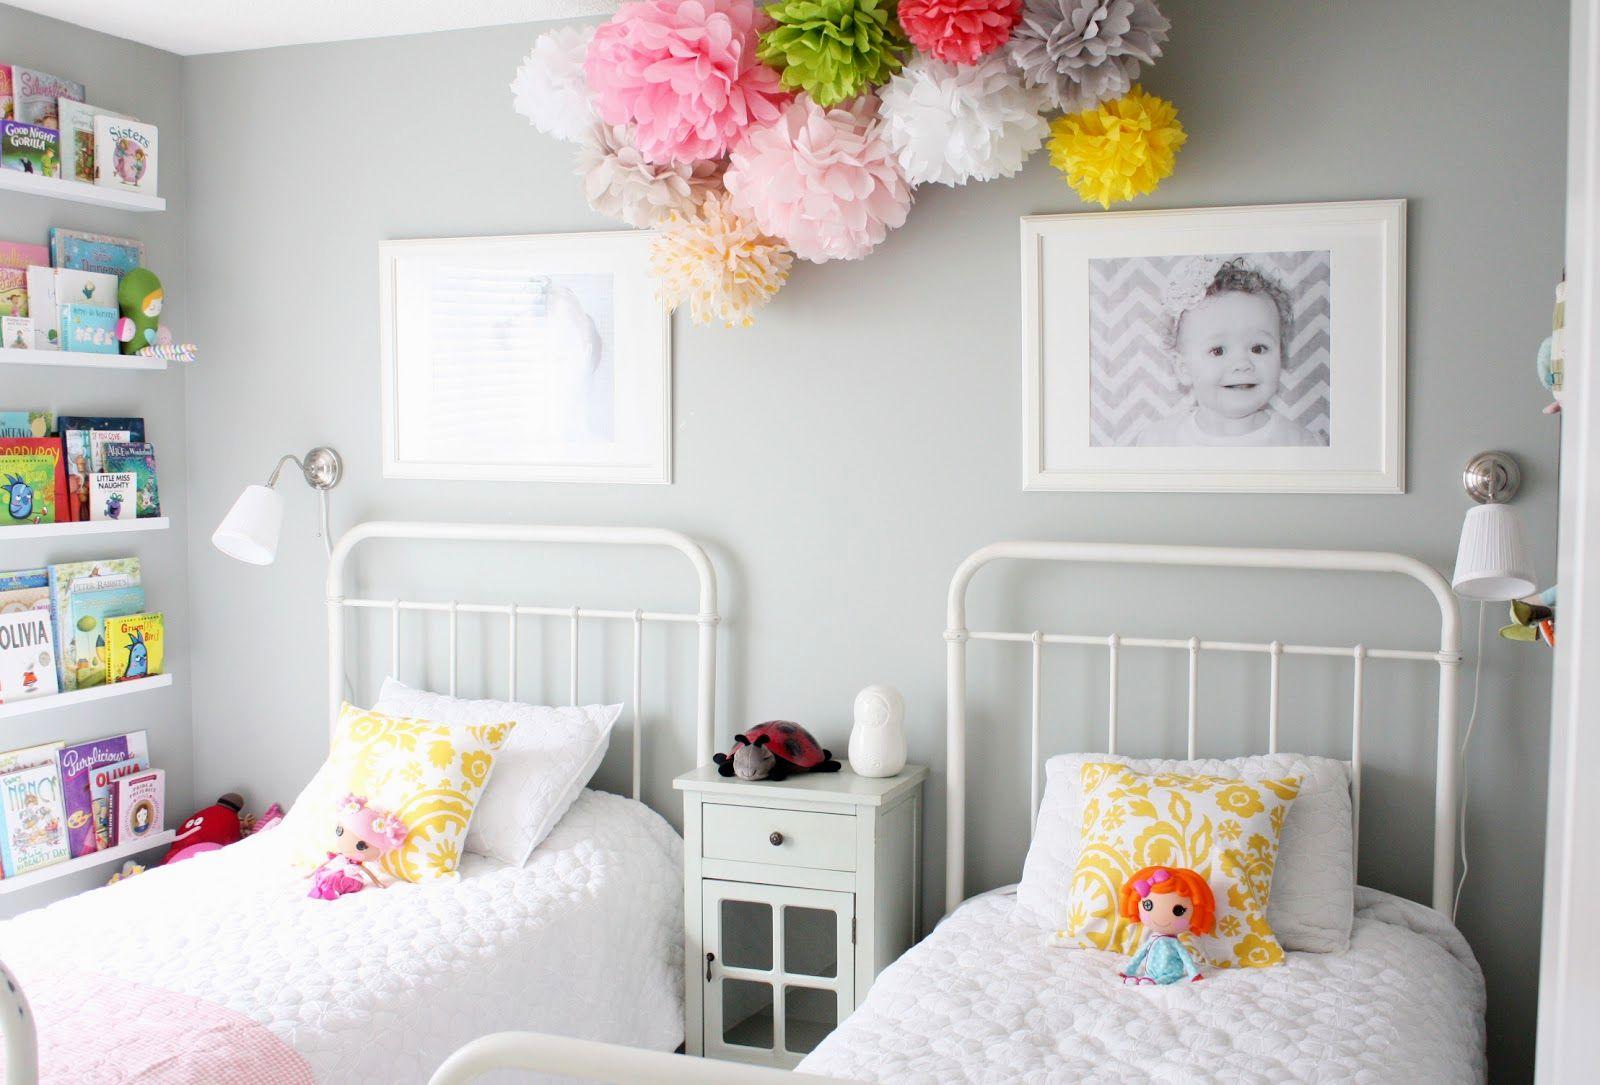 finest kids bathroom ideas photo-Excellent Kids Bathroom Ideas Inspiration